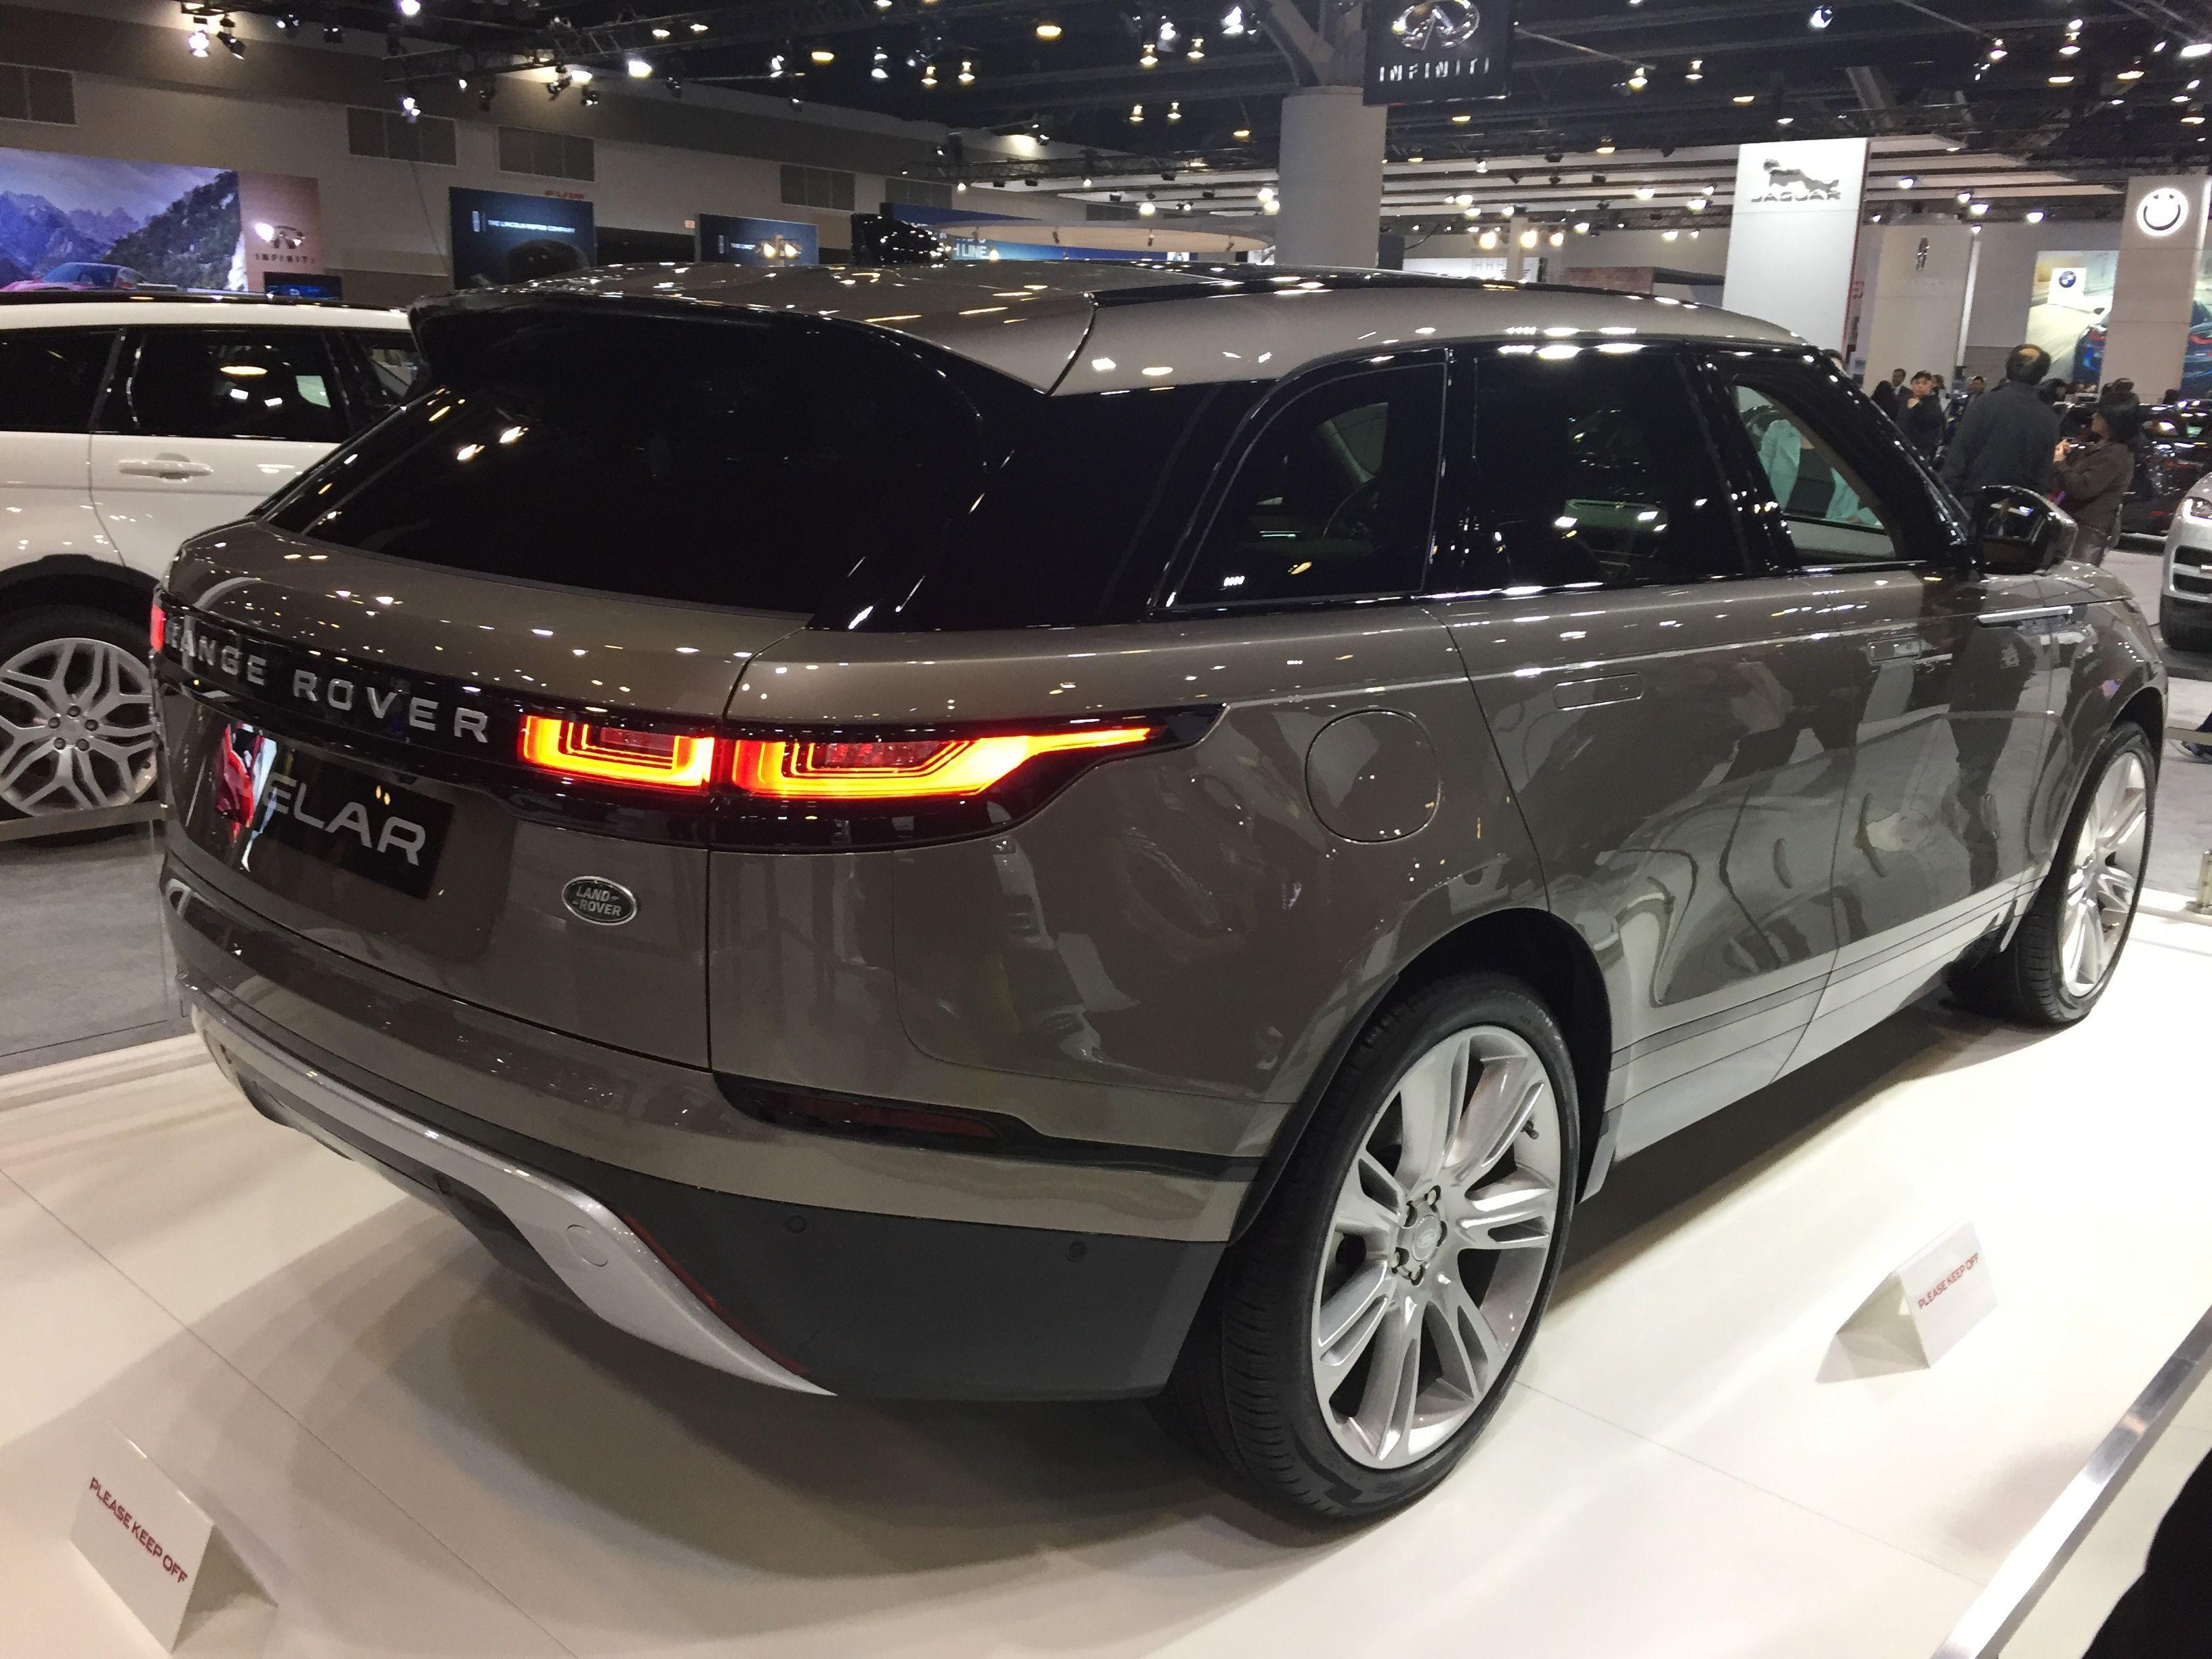 50 Best Luxury Cars For Winter Best Luxury Cars Range Rover Range Rover Car